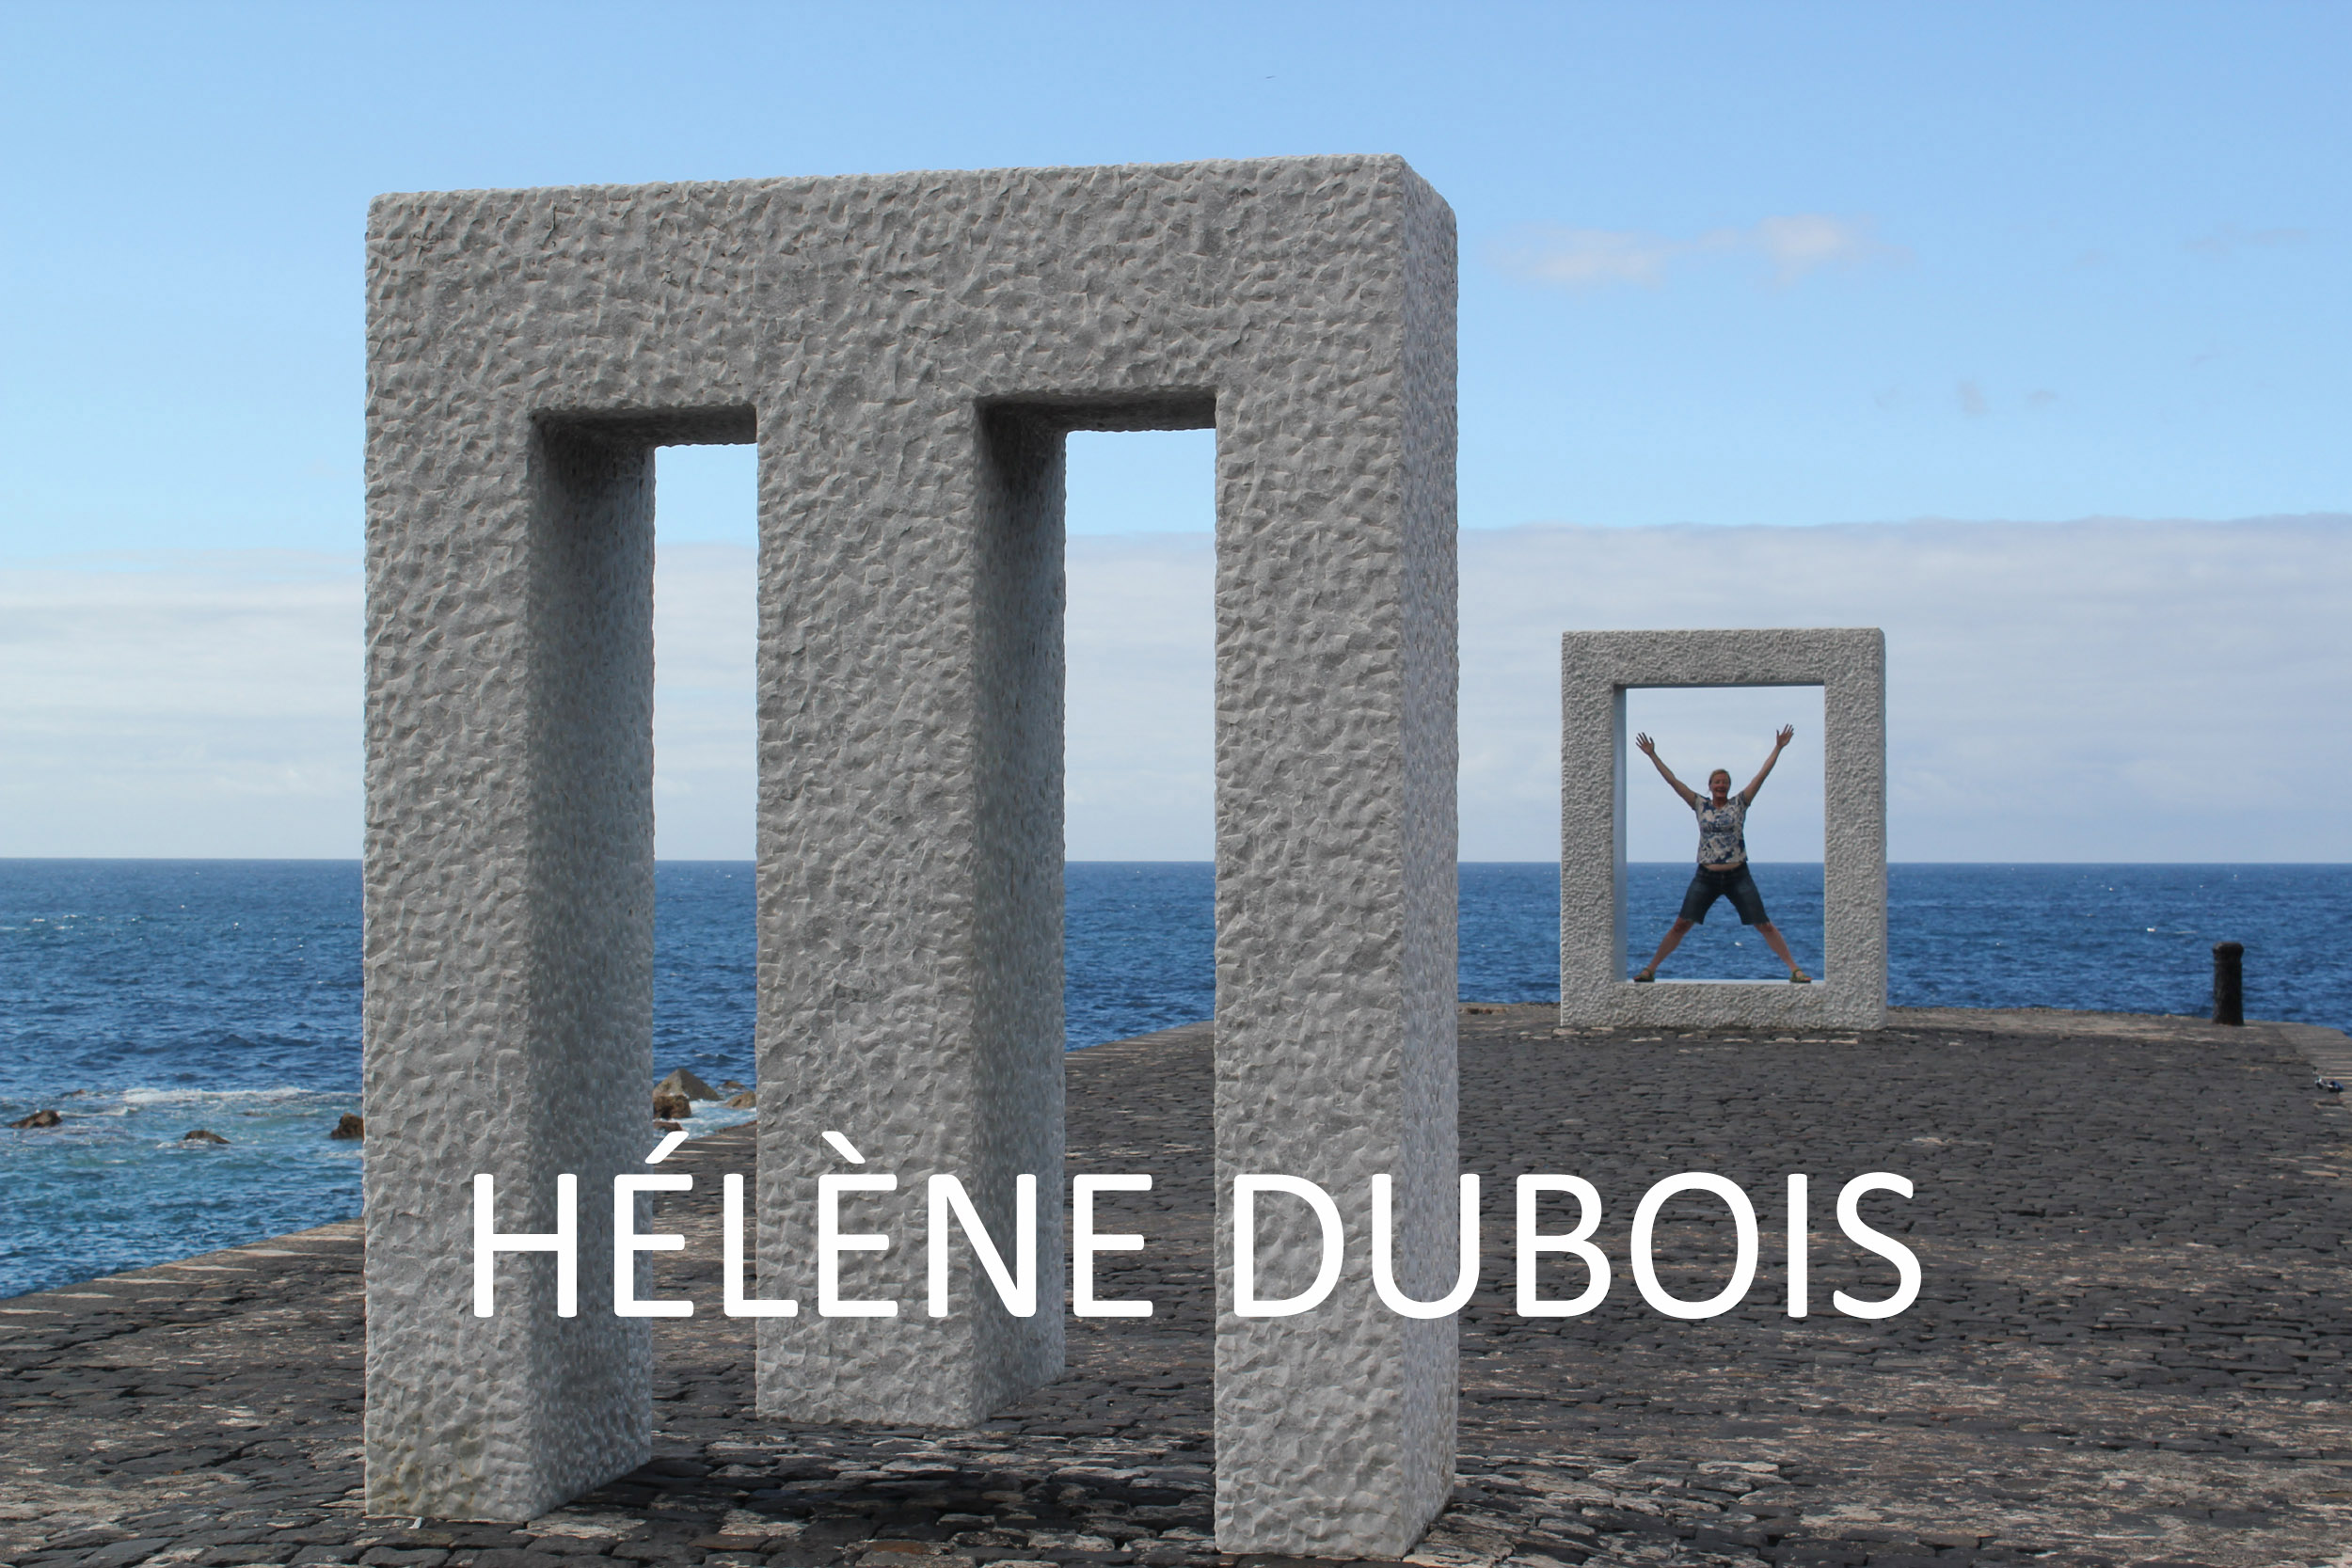 Hélène Dubois